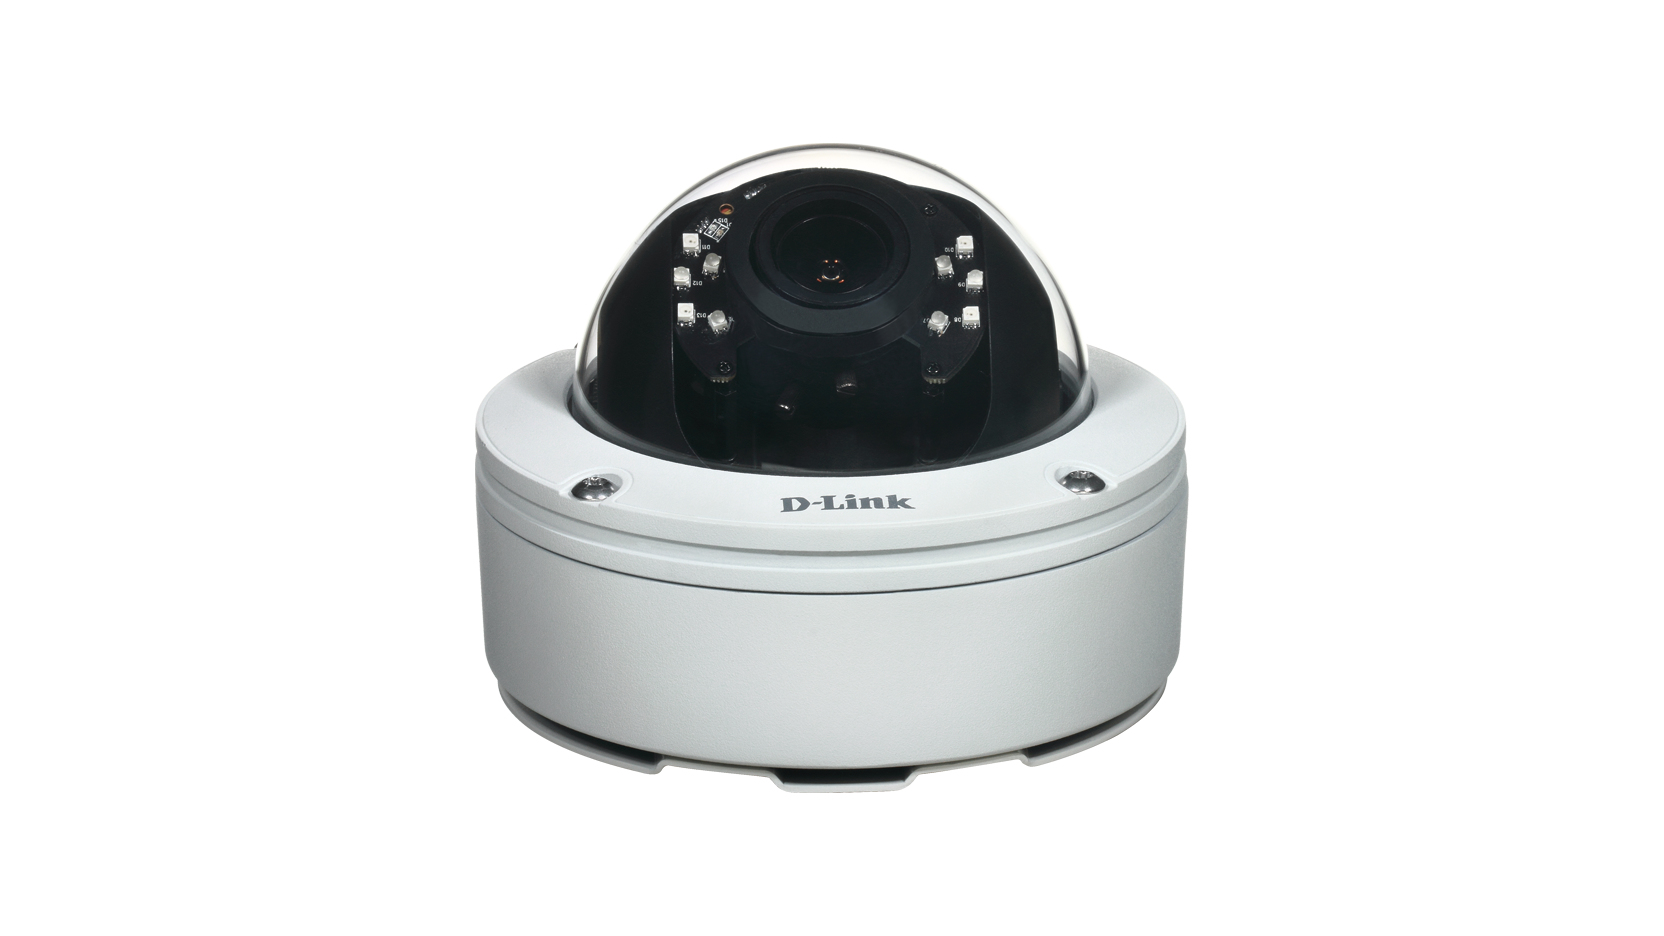 D-Link DCS-6517 cámara de vigilancia Cámara de seguridad IP Exterior Almohadilla Techo 2560 x 1920 Pixeles